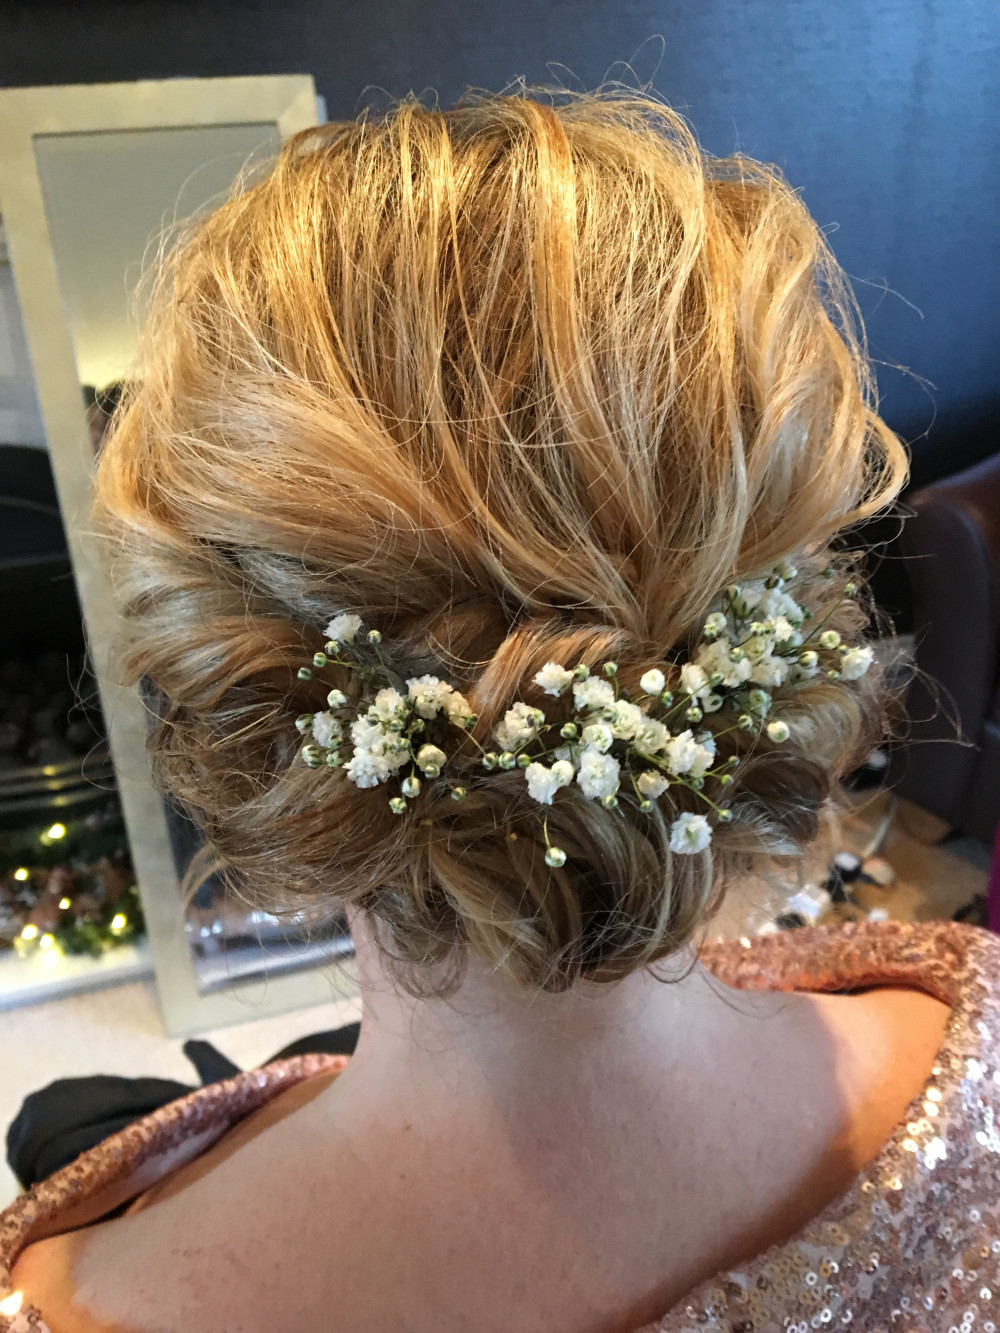 - Make Me Bridal Artist: Lisa gadsby wedding hair specialist . Photography by: Photo taken my me . #bohemian #bridalhair #flowersinherhair #soft #flowers #softupdo #softhairup